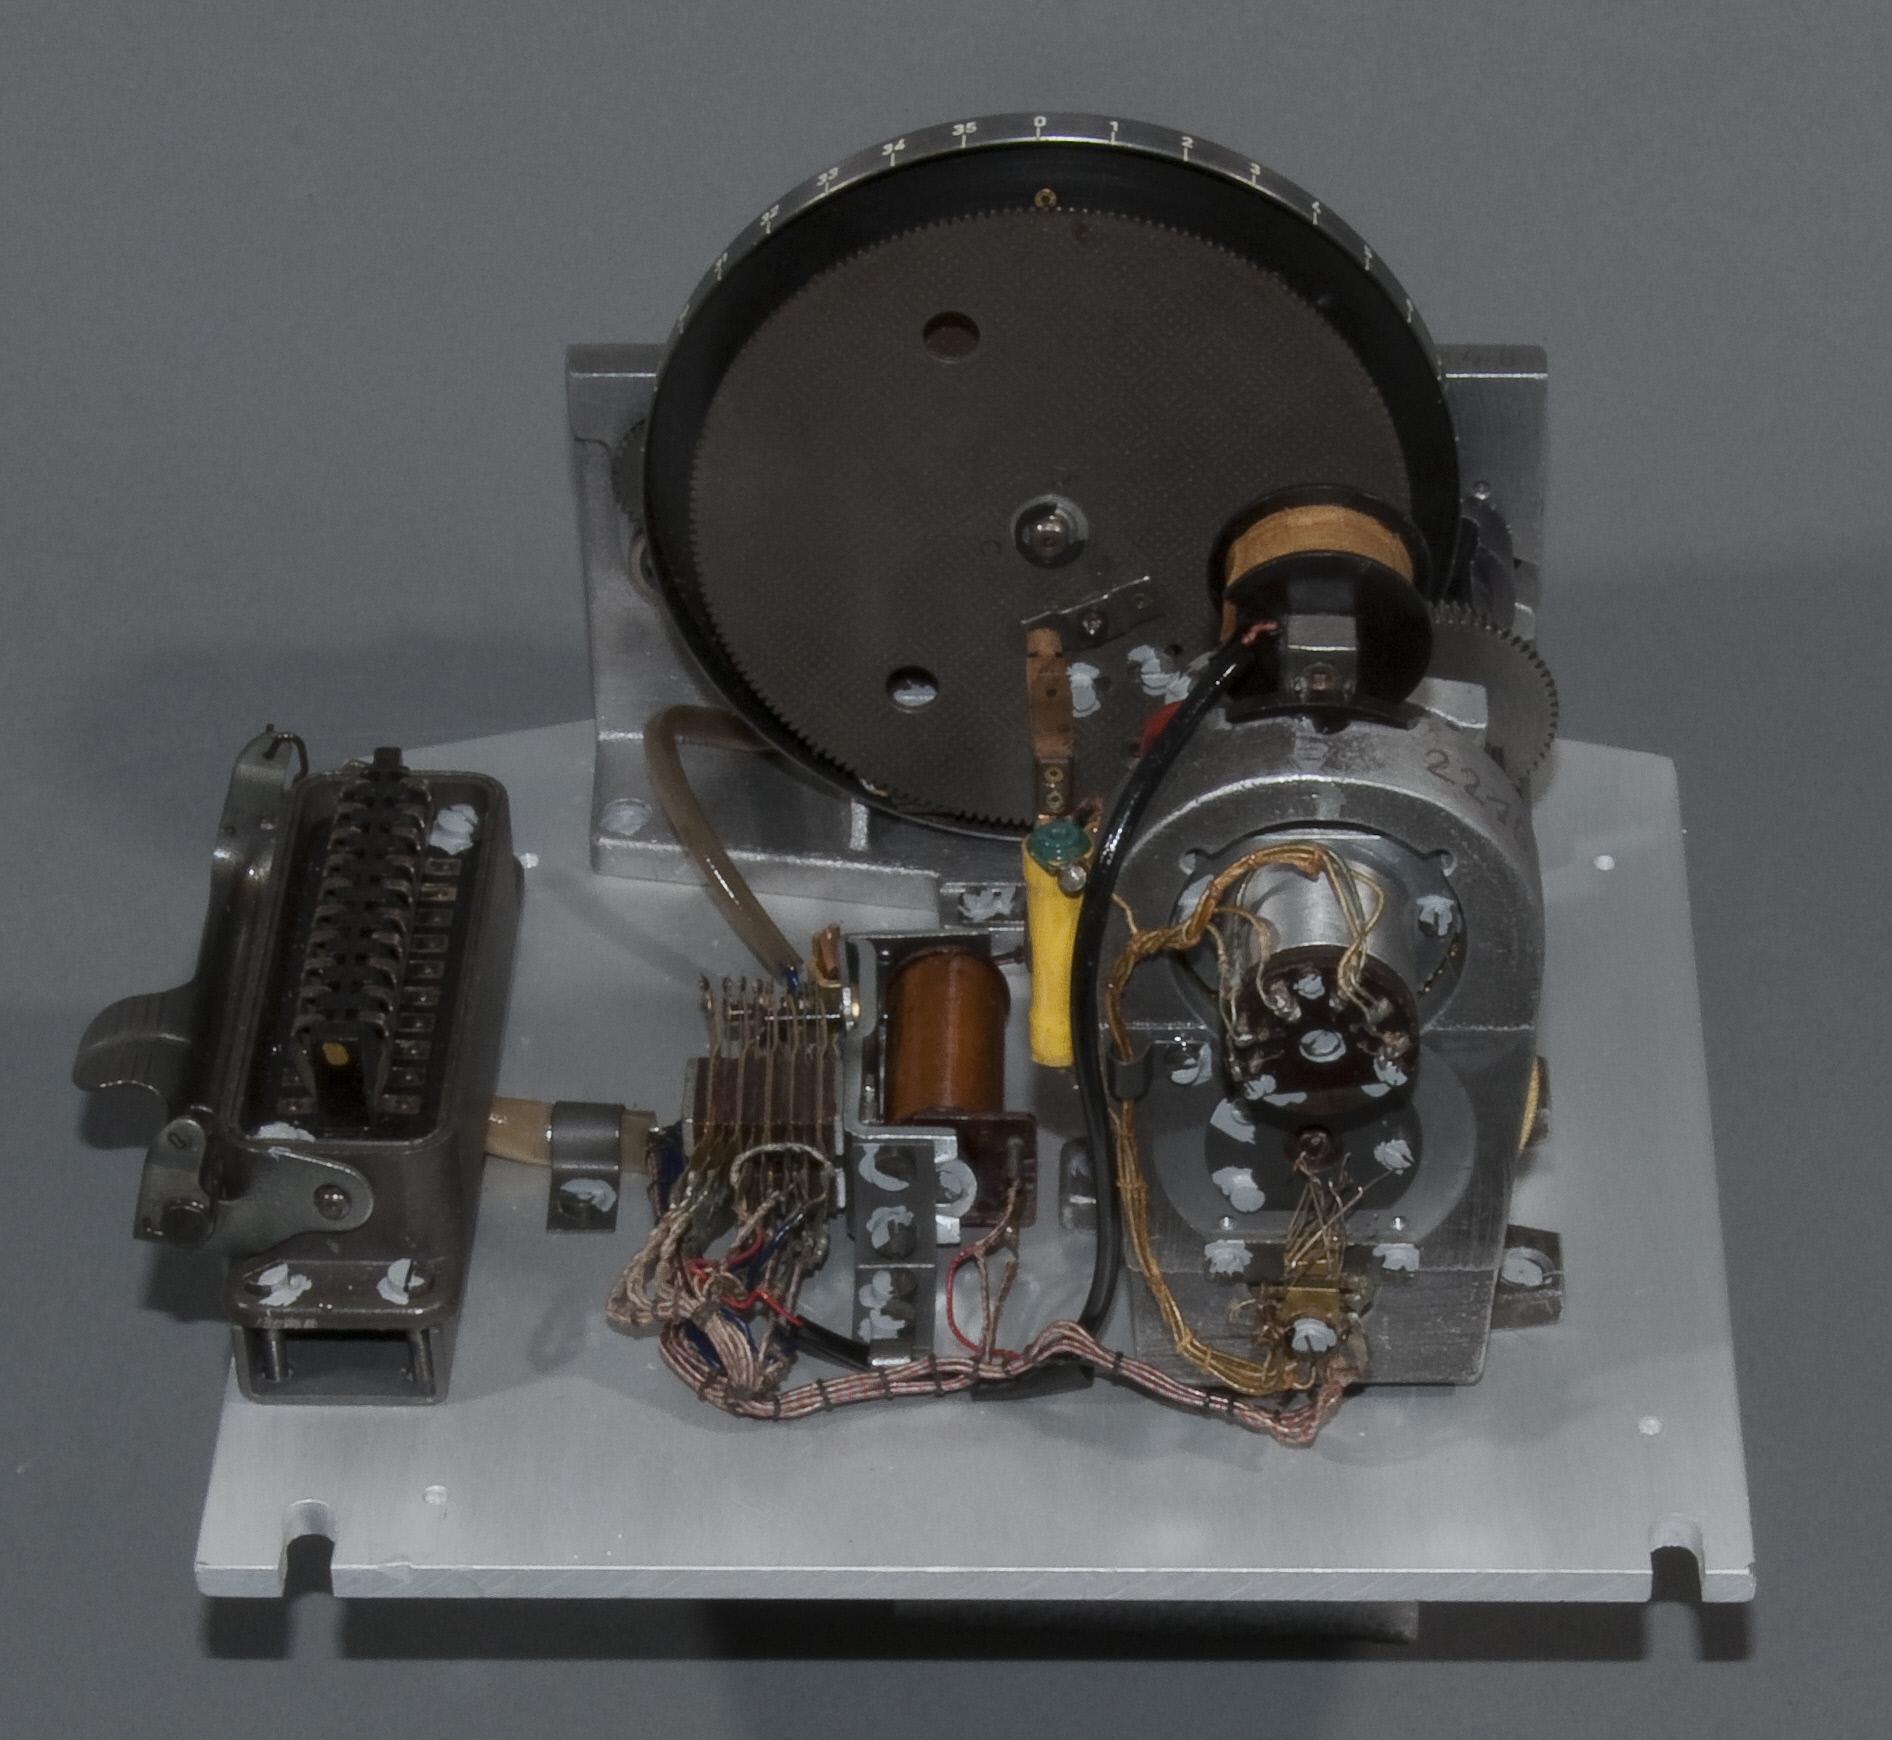 Pendulous Integrating Gyroscopic Accelerometer